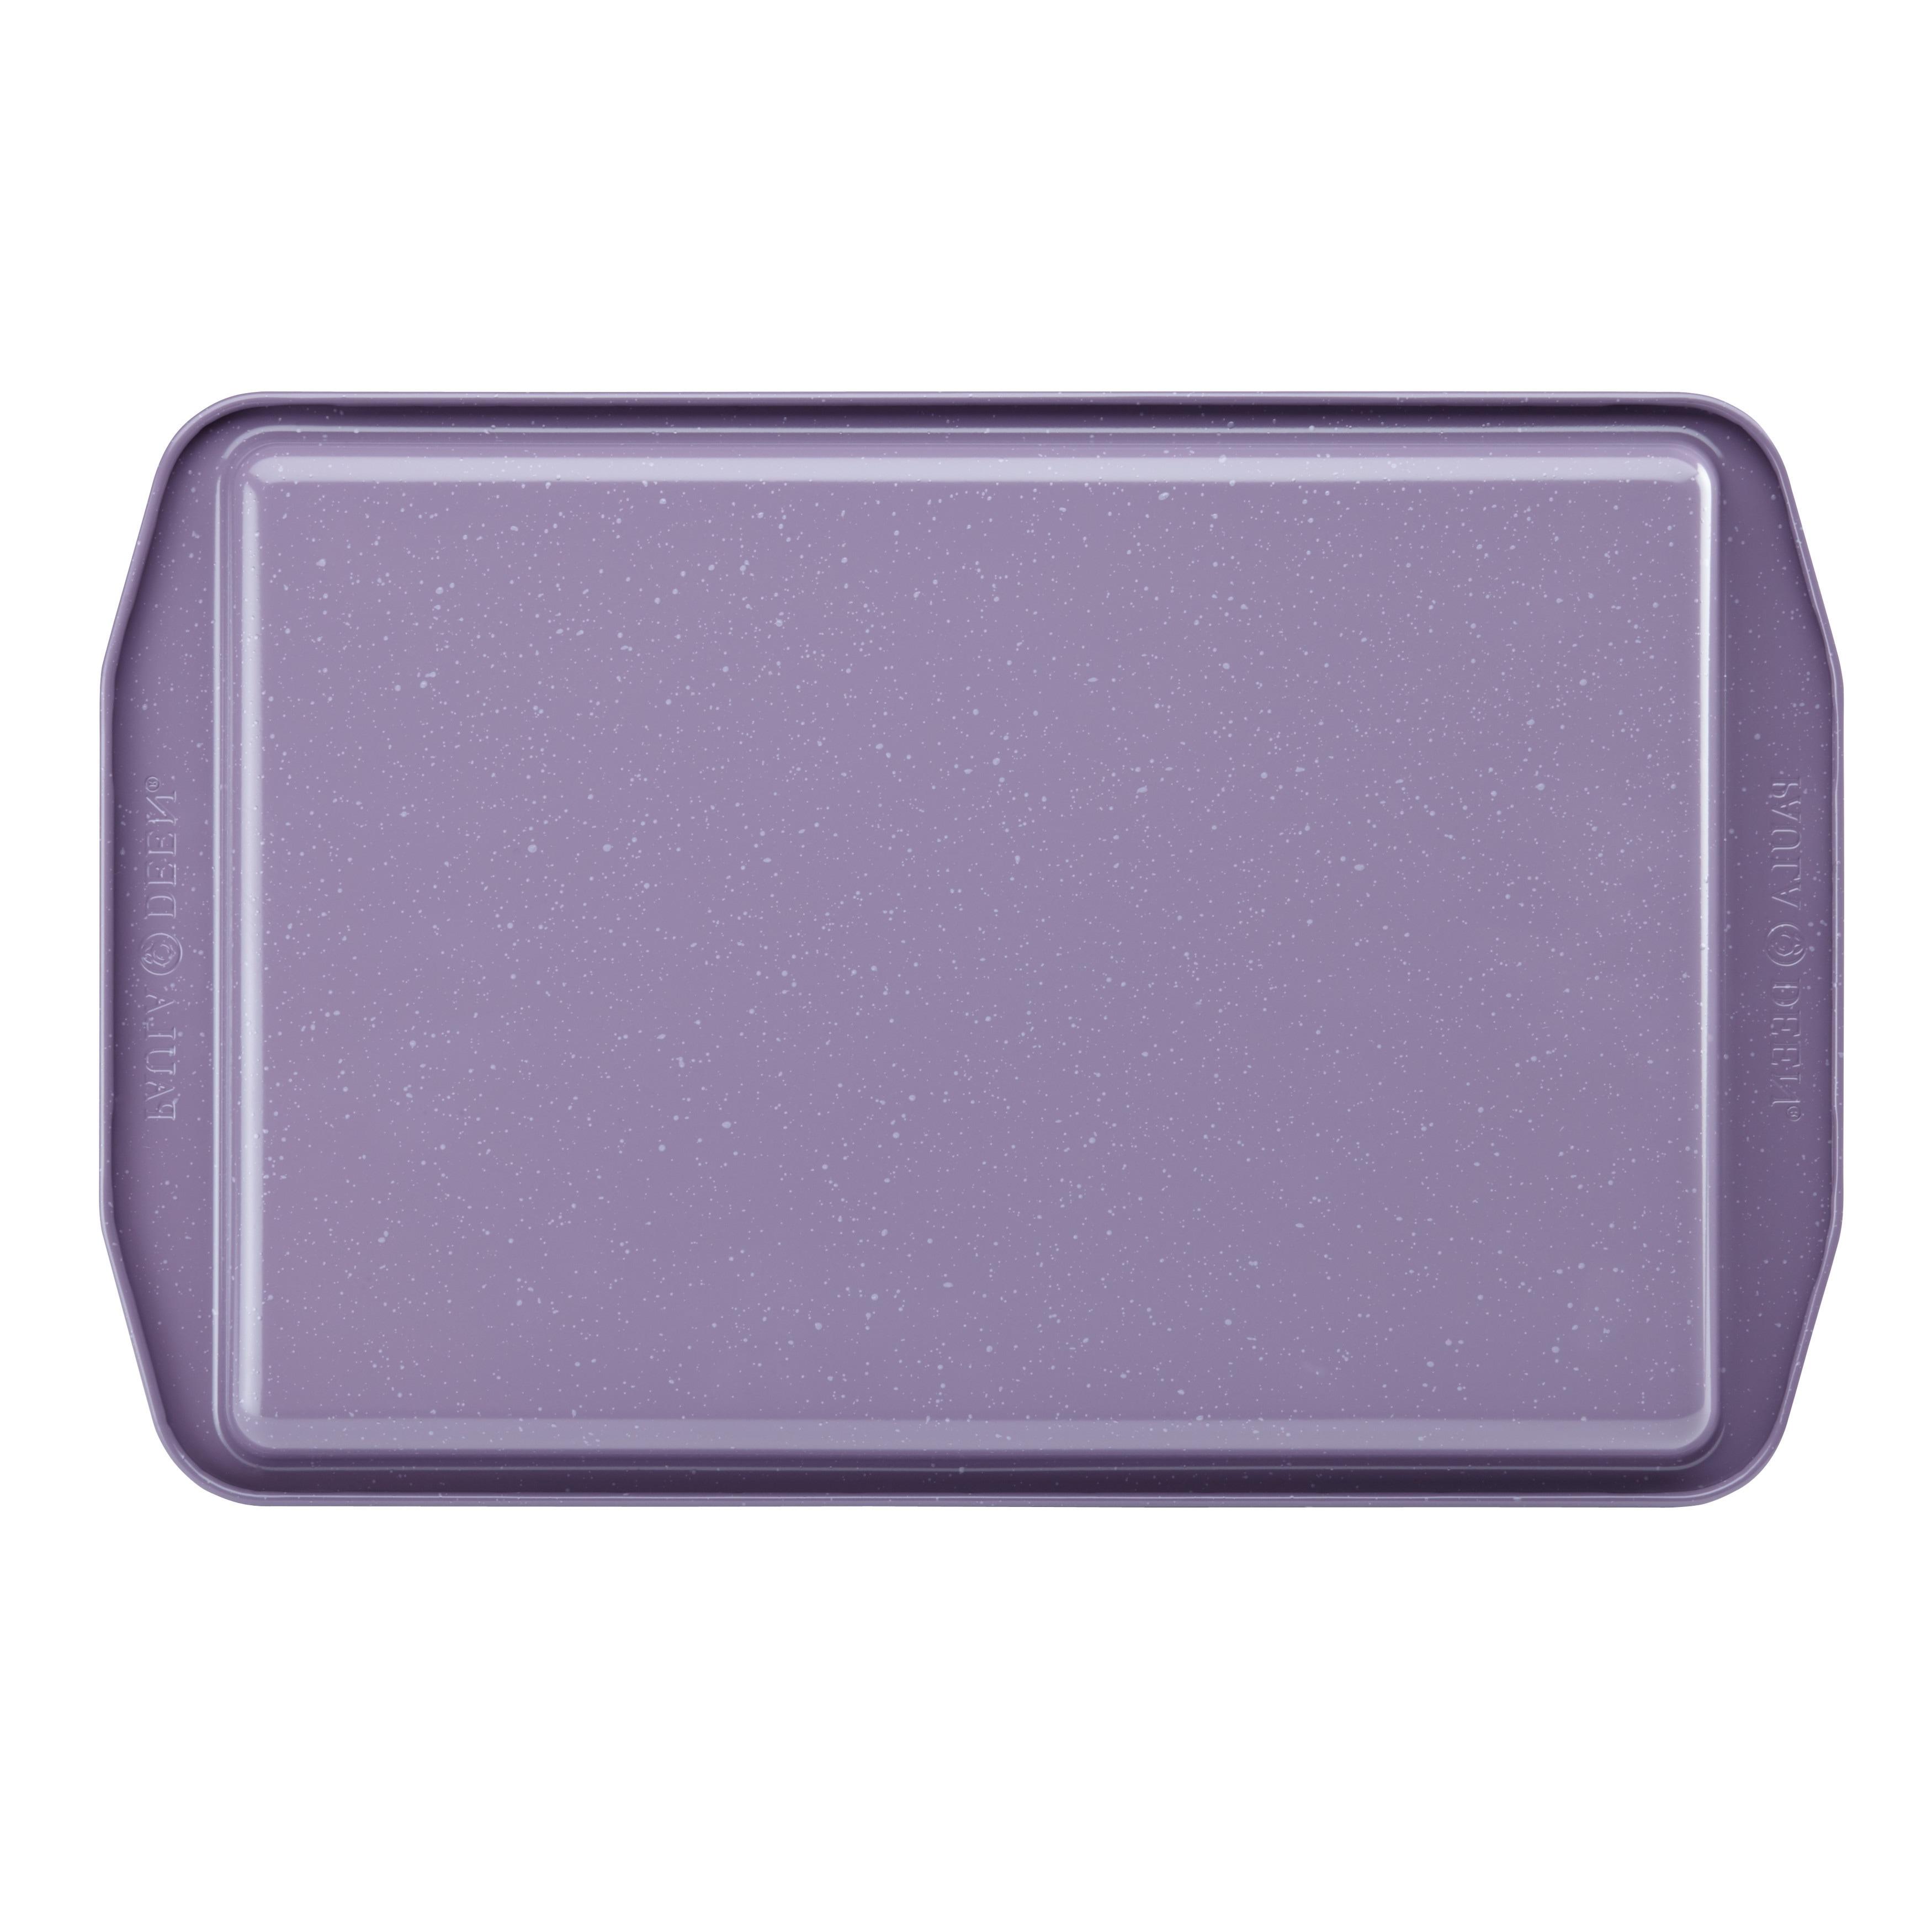 PAULA Deen Speckle Nonstick Bakeware 11-Inch x 17-Inch Co...